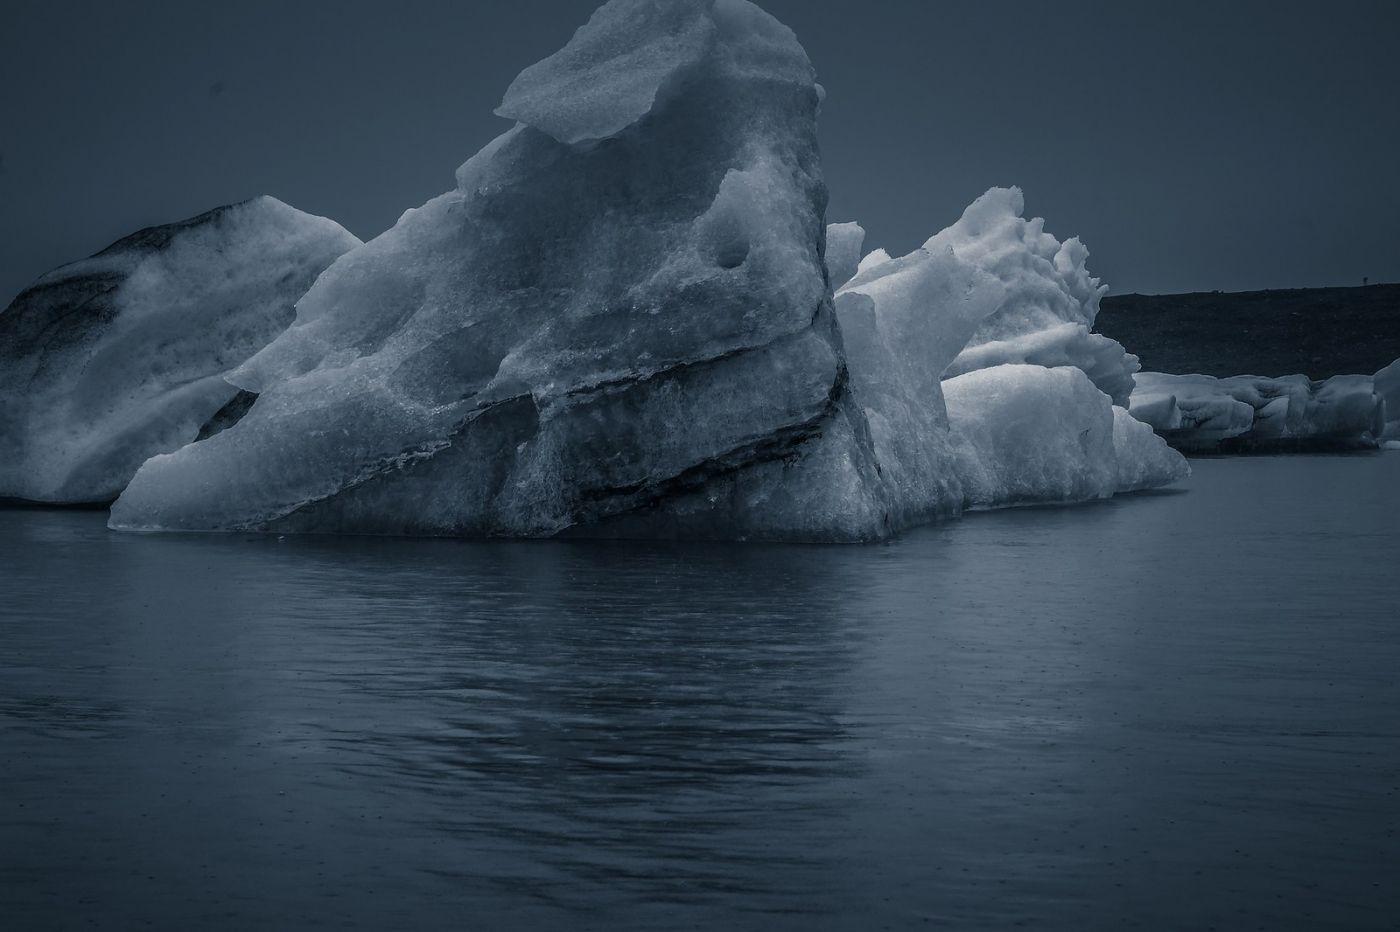 冰岛冰川泻湖(Glacier Lagoon),流动的冰川_图1-2